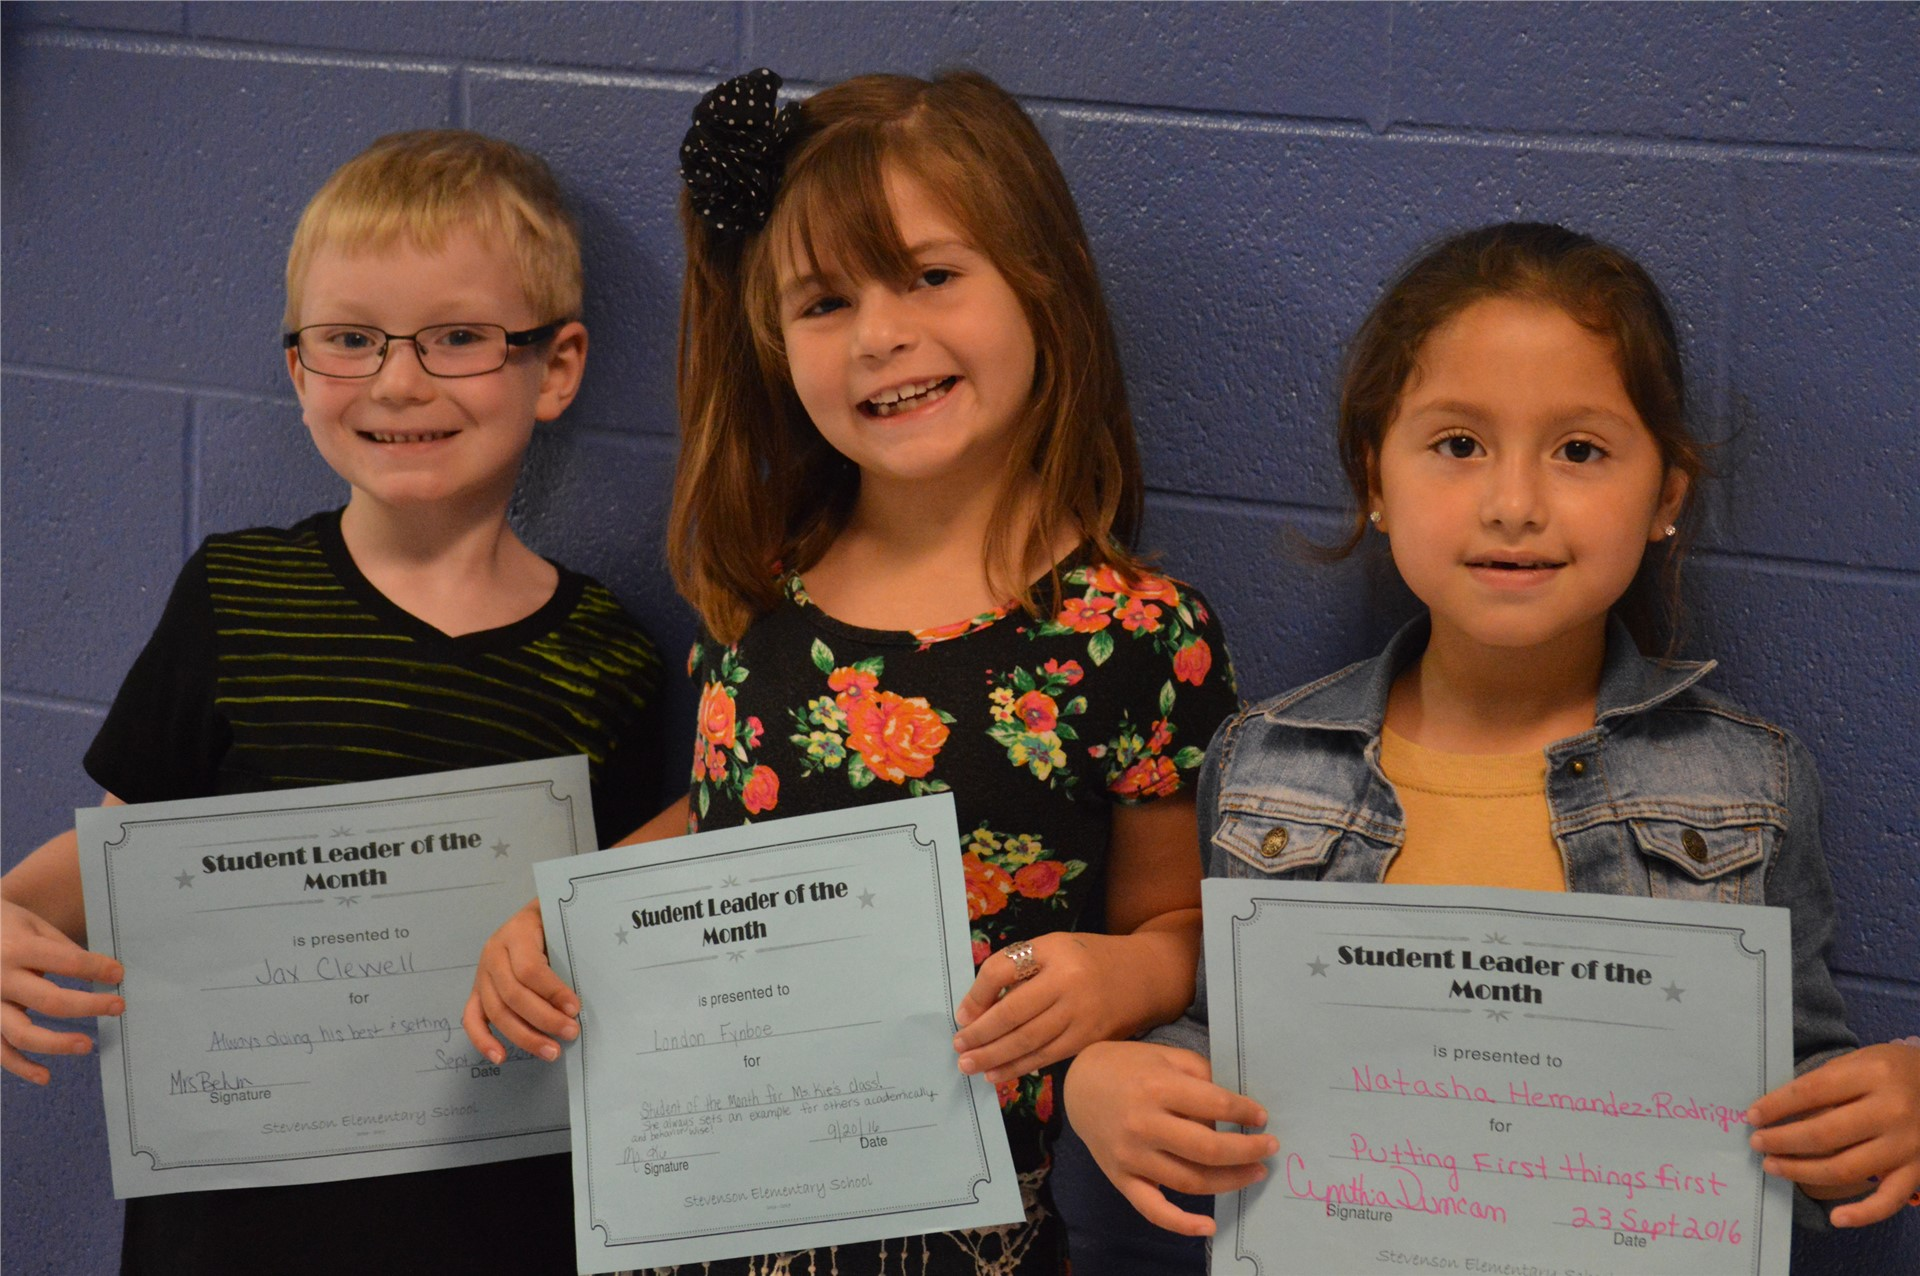 1st Graders:  Jax Clewell; Landon Fynboe; Natasha Hernandez-Rodriquez